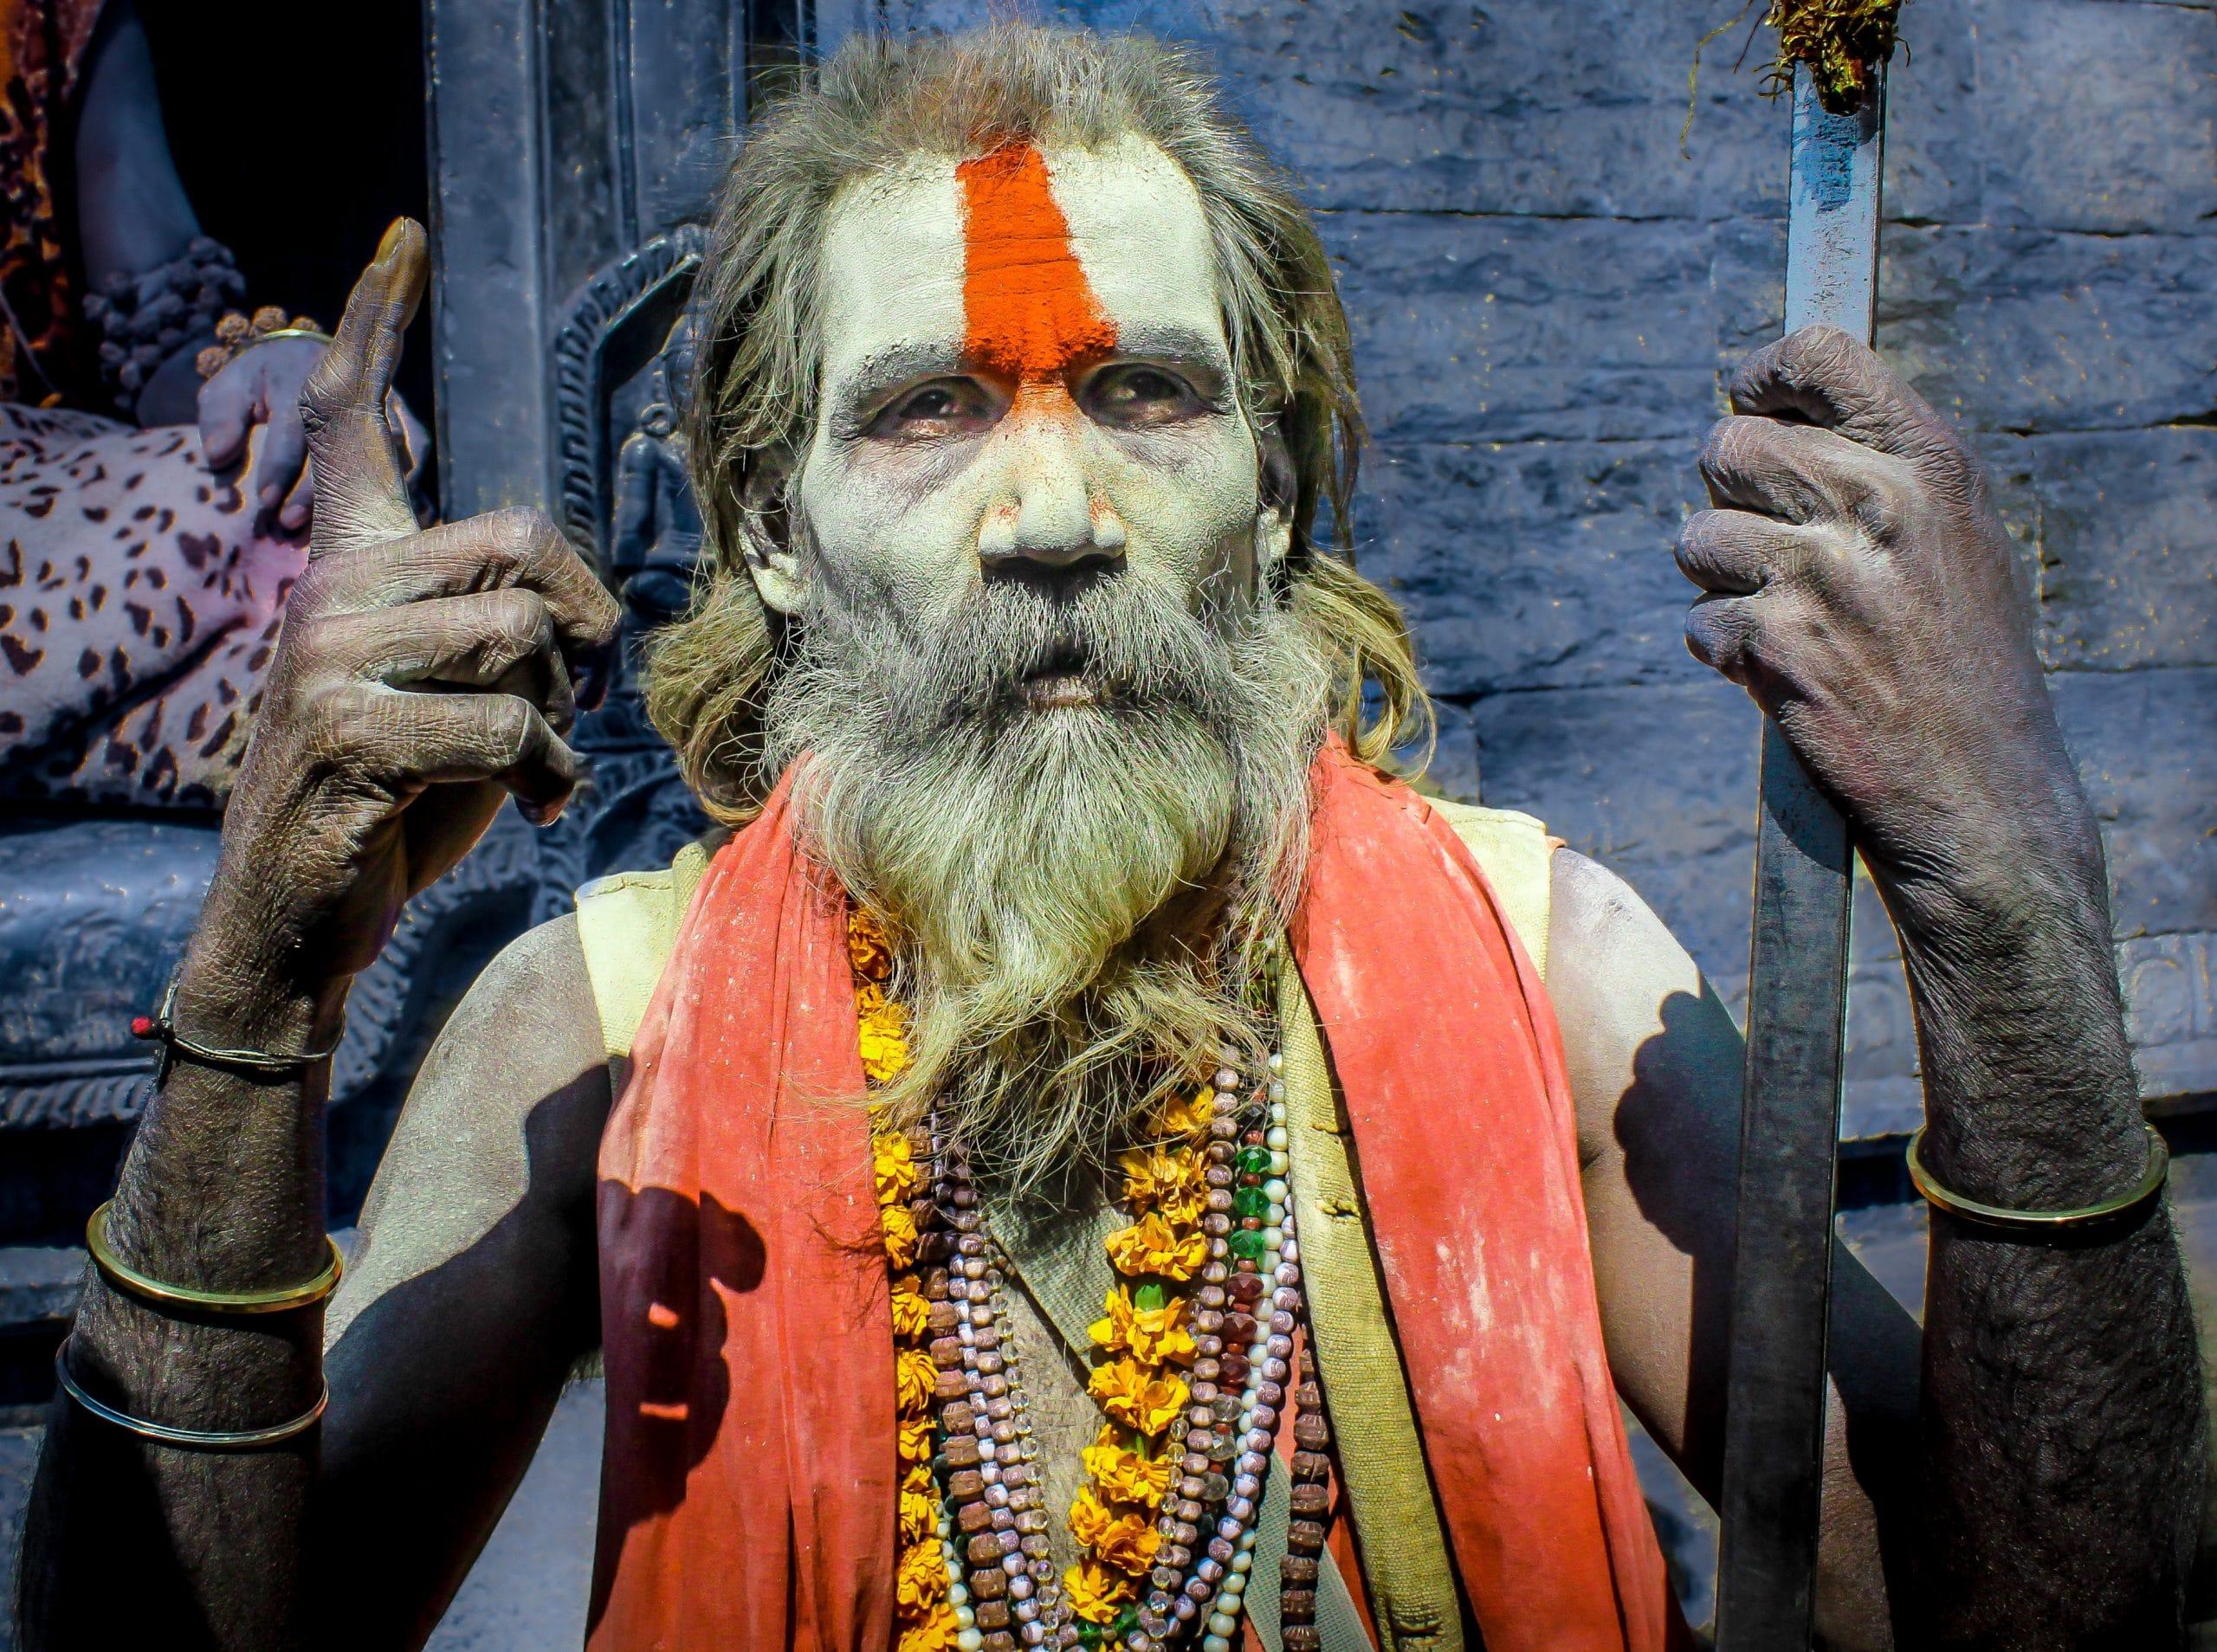 Homem hindu cheio de pinturas e roupas coloridas.